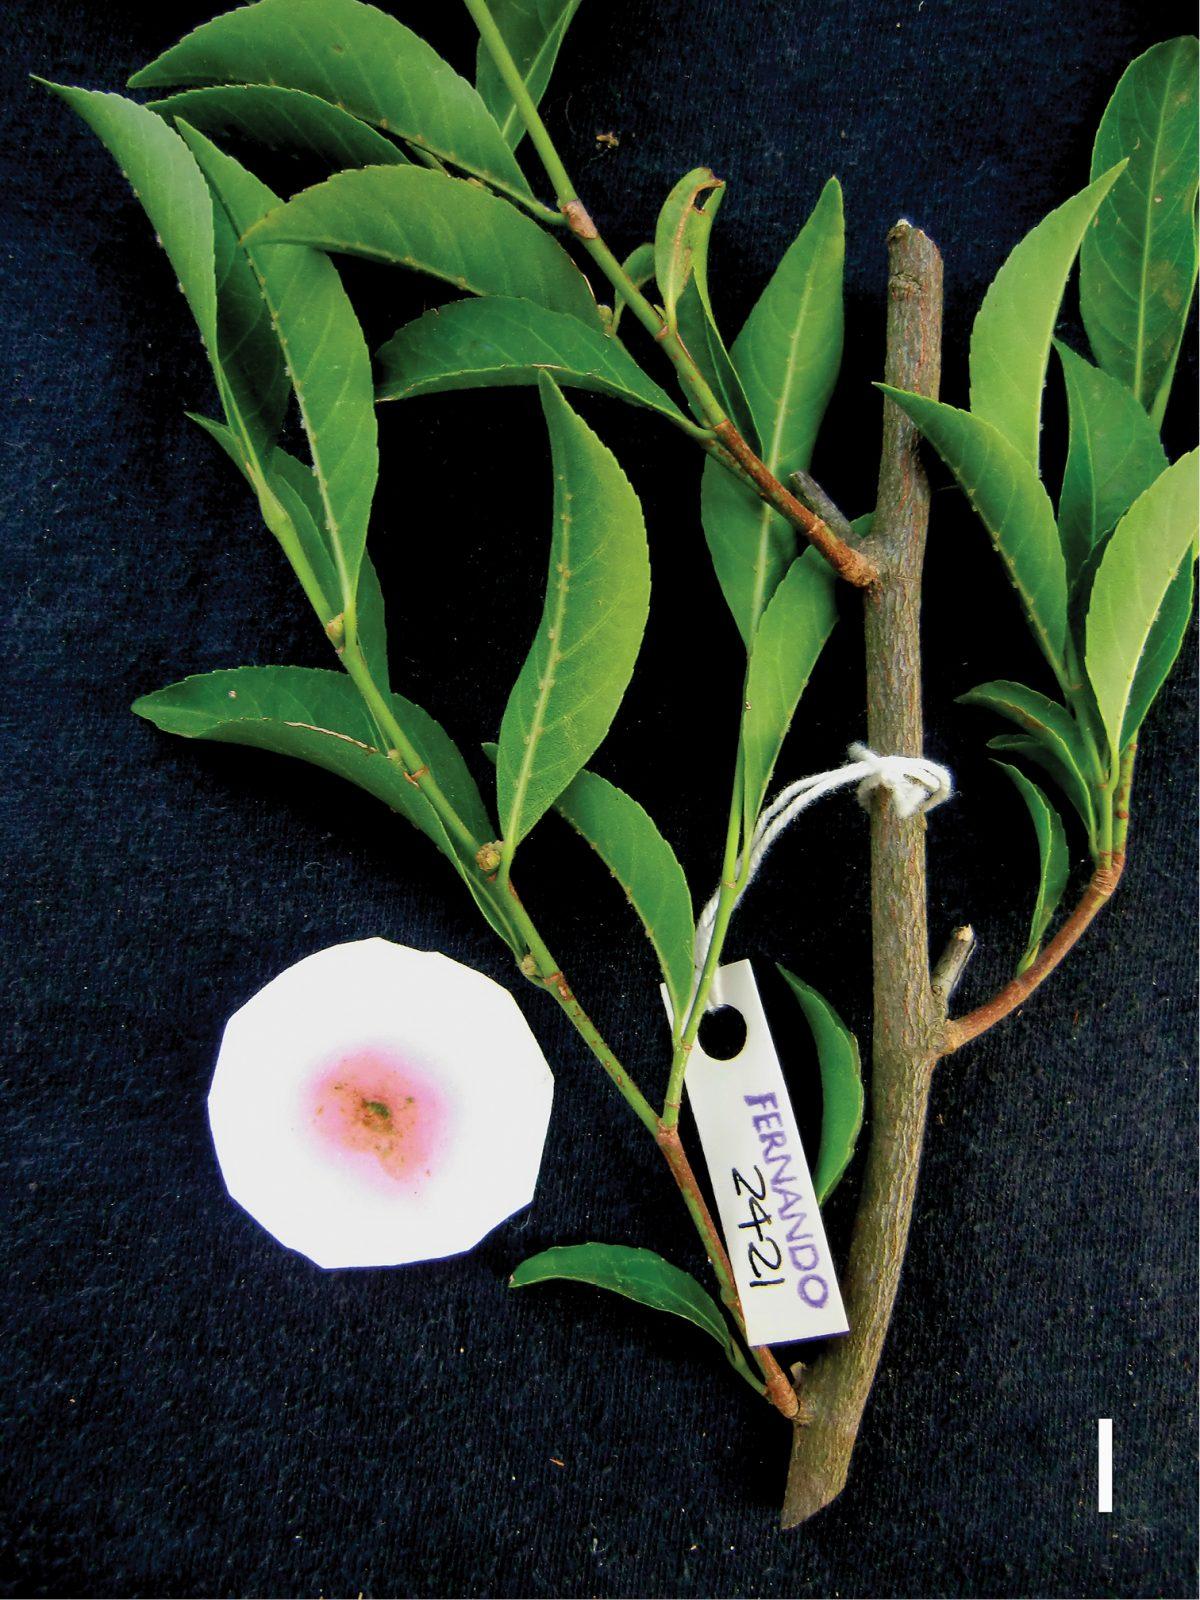 Metal-eating plant named Rinorea niccolifera. Photo by Dr. Edwino S. Fernando / UPLB